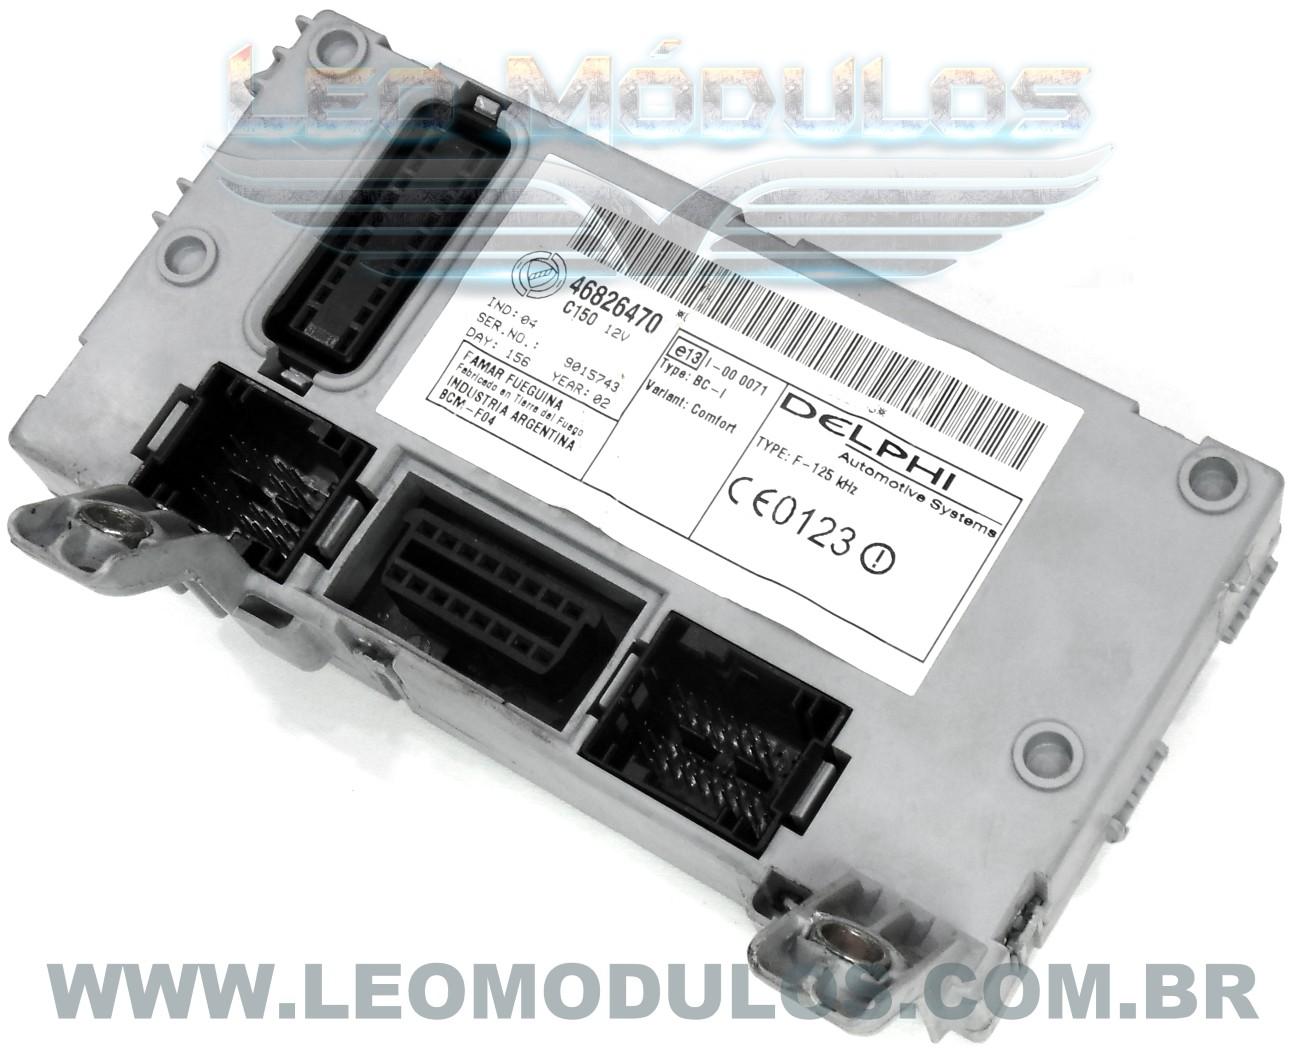 Body Computer BC Delphi 46826470 - Fiat Palio Siena Strada 1.0 16V - Leo Módulos